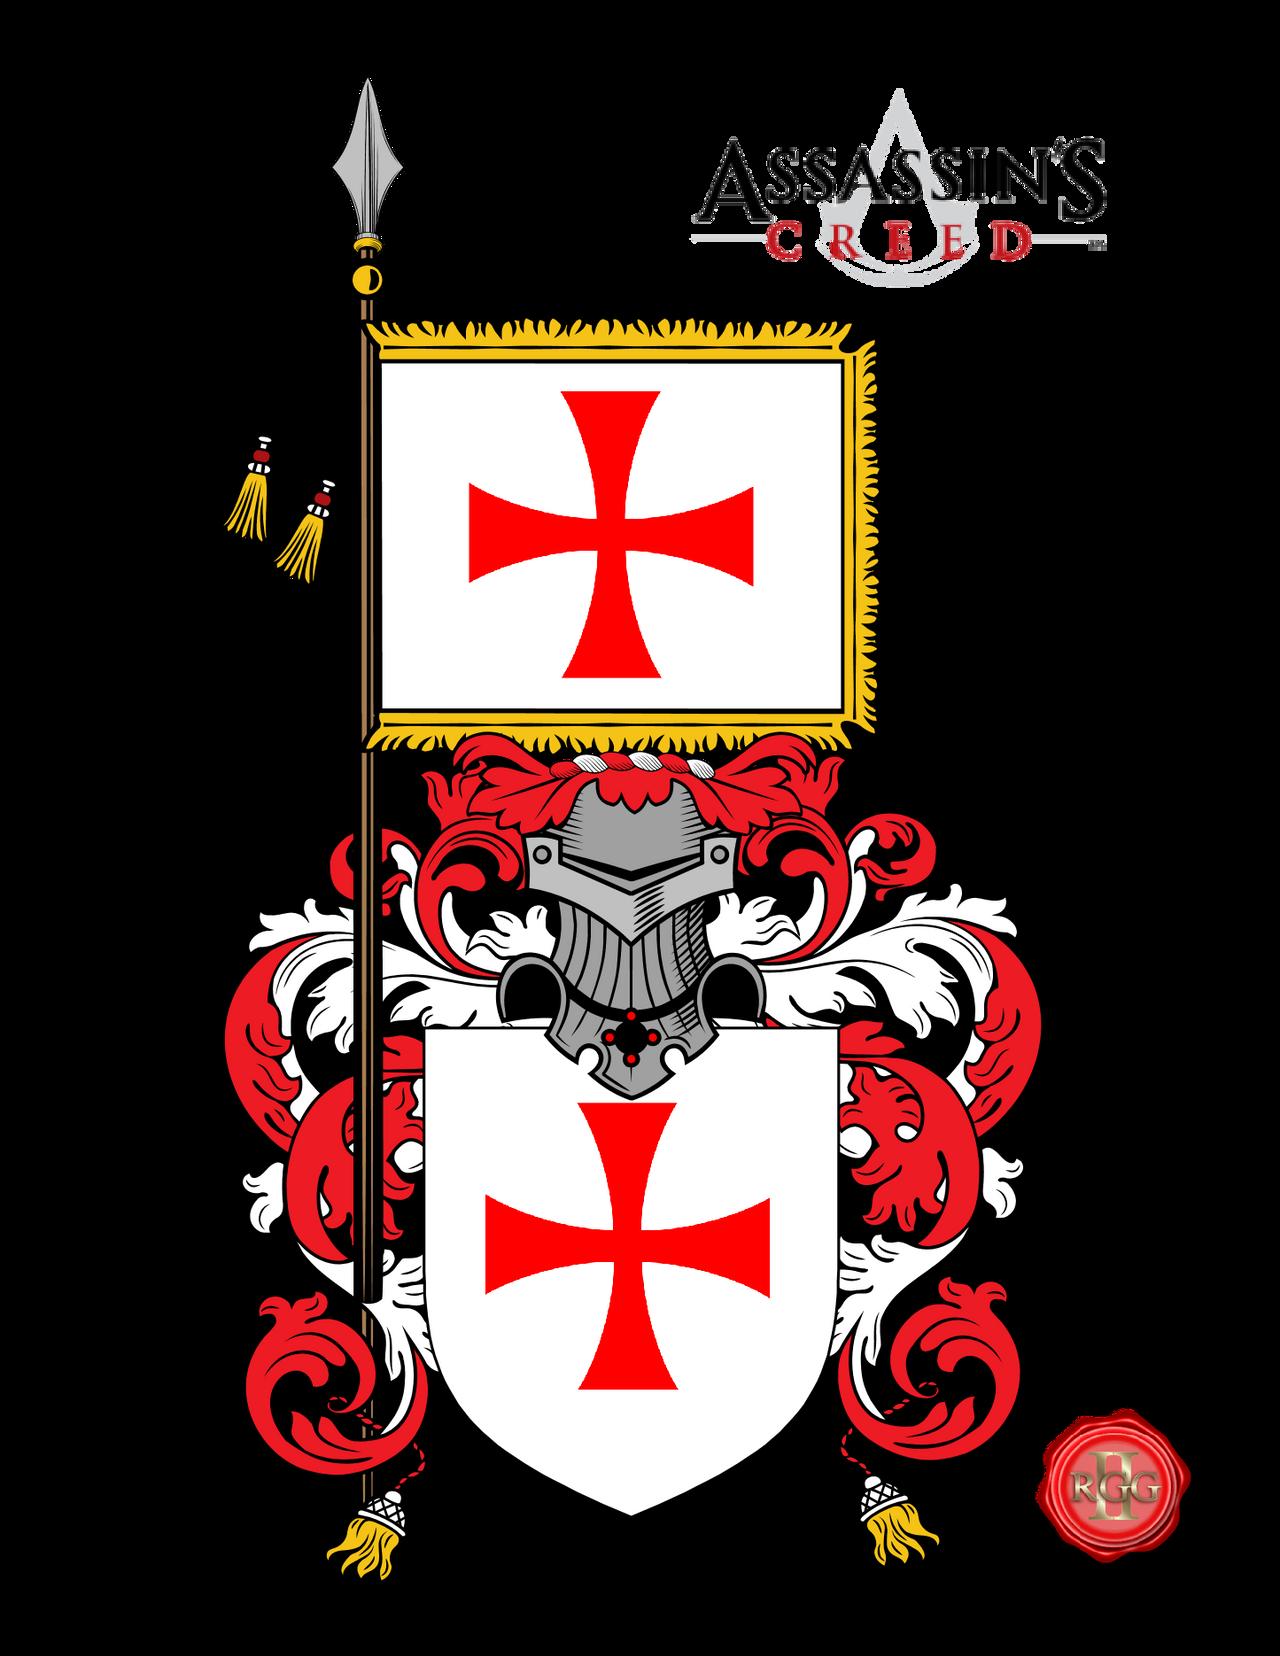 Templar Cross Assassins Creed Assassin's Creed COA T...